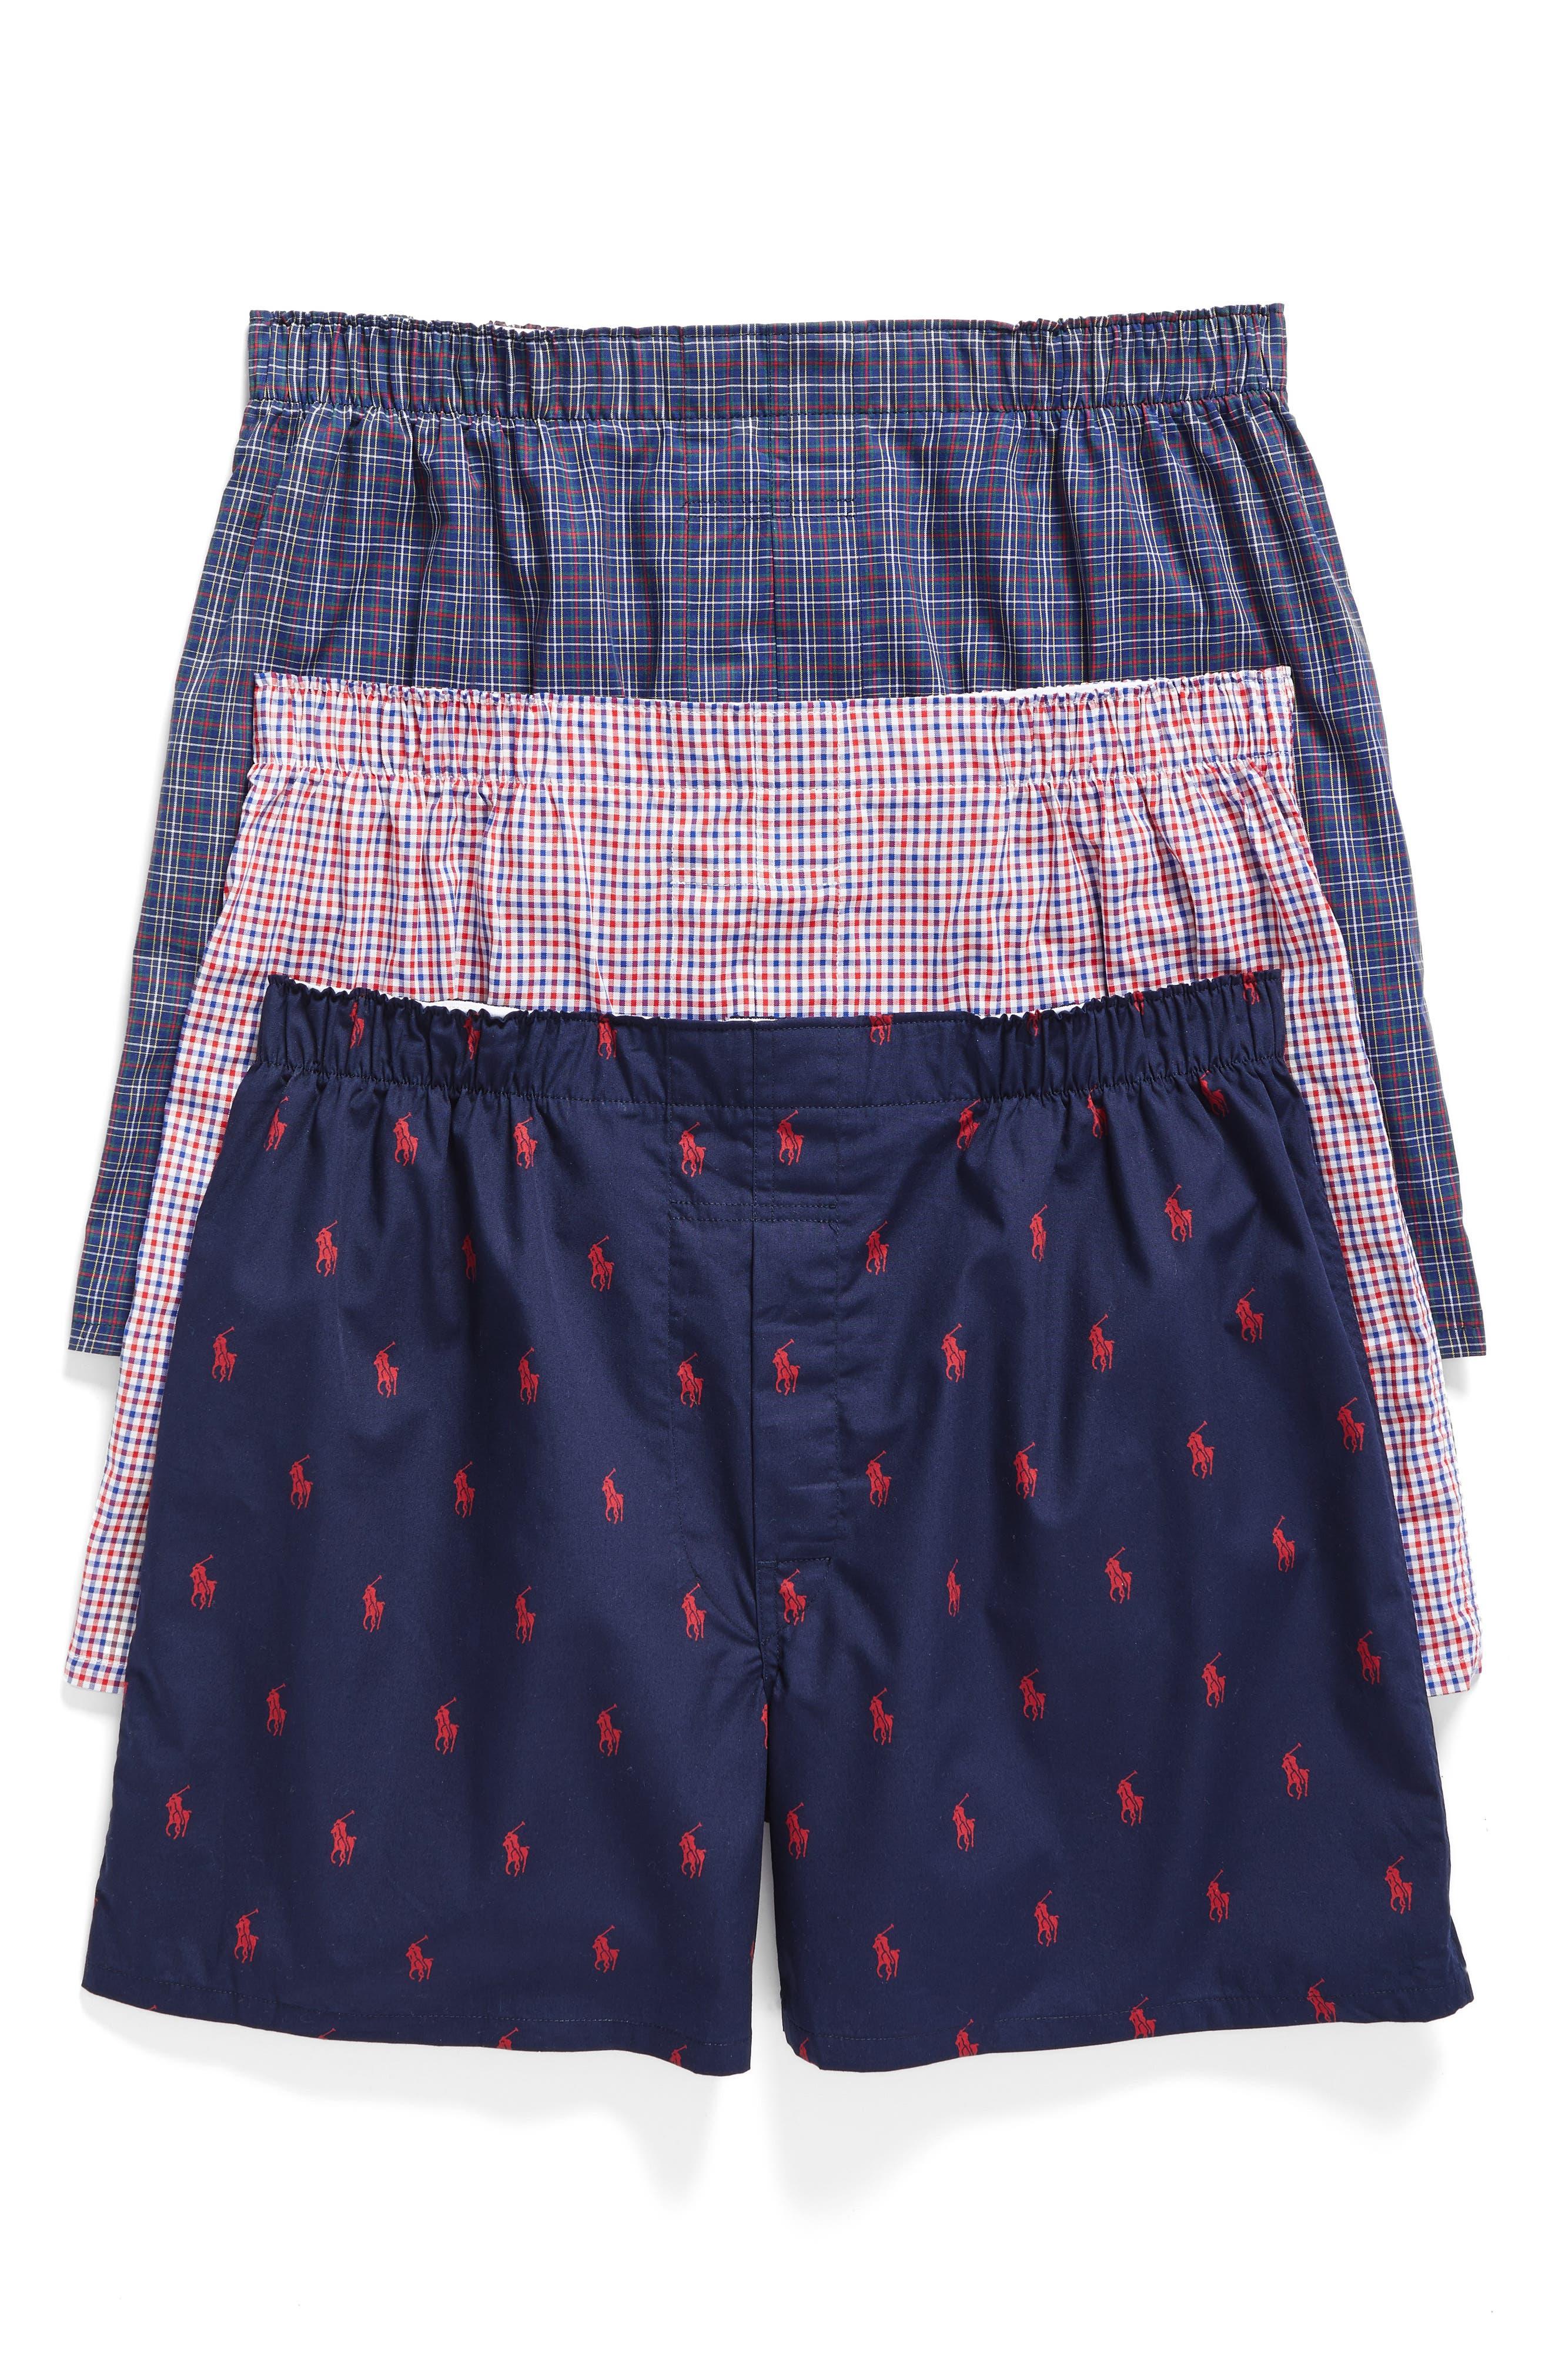 3-Pack Woven Cotton Boxers,                             Main thumbnail 1, color,                             Navy/ Red Plaid/ Blue Plaid